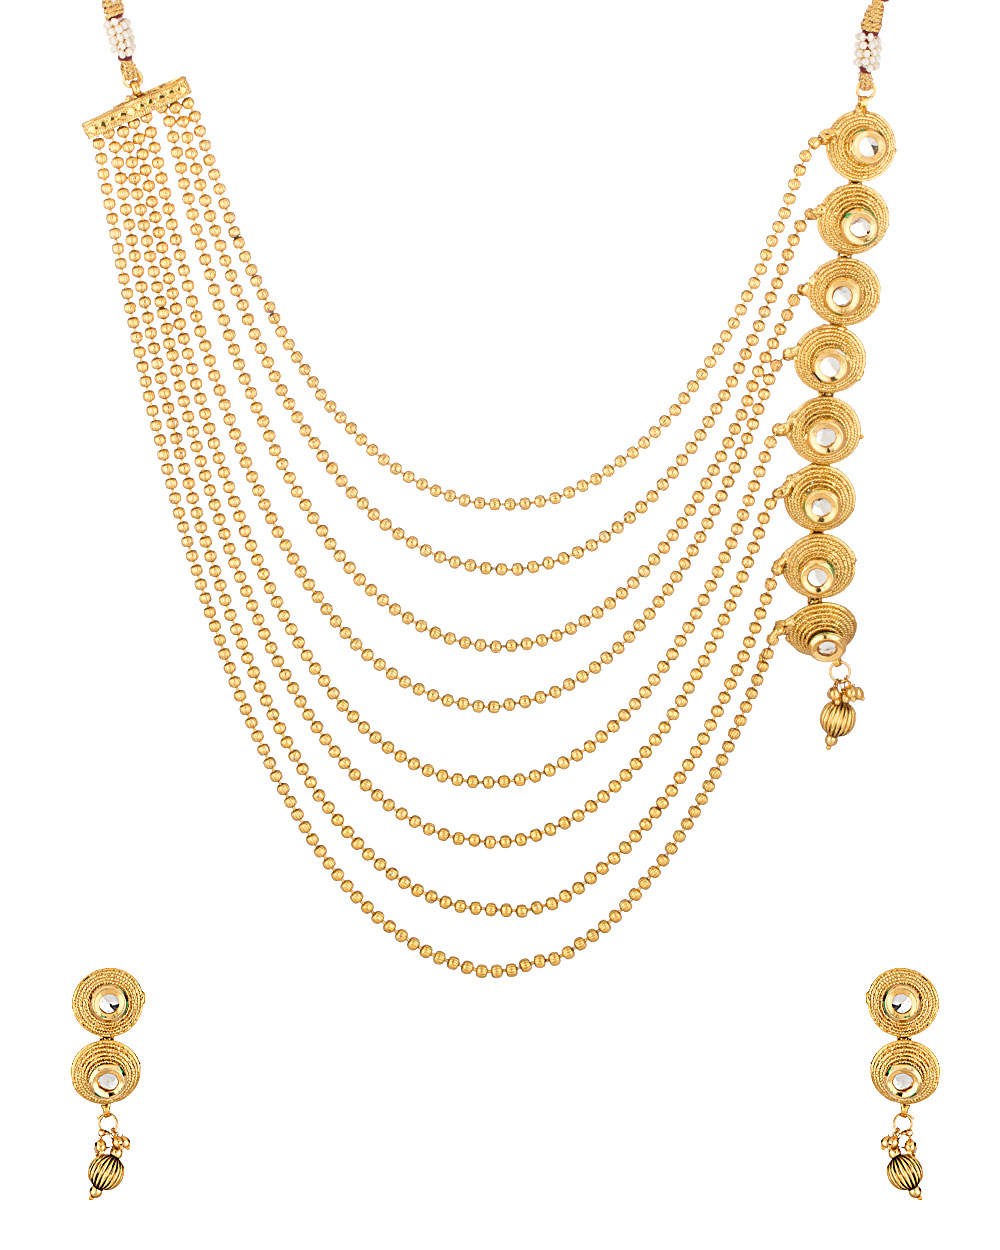 Buy Traditional Gold Tone Necklace Set Online India | Voylla